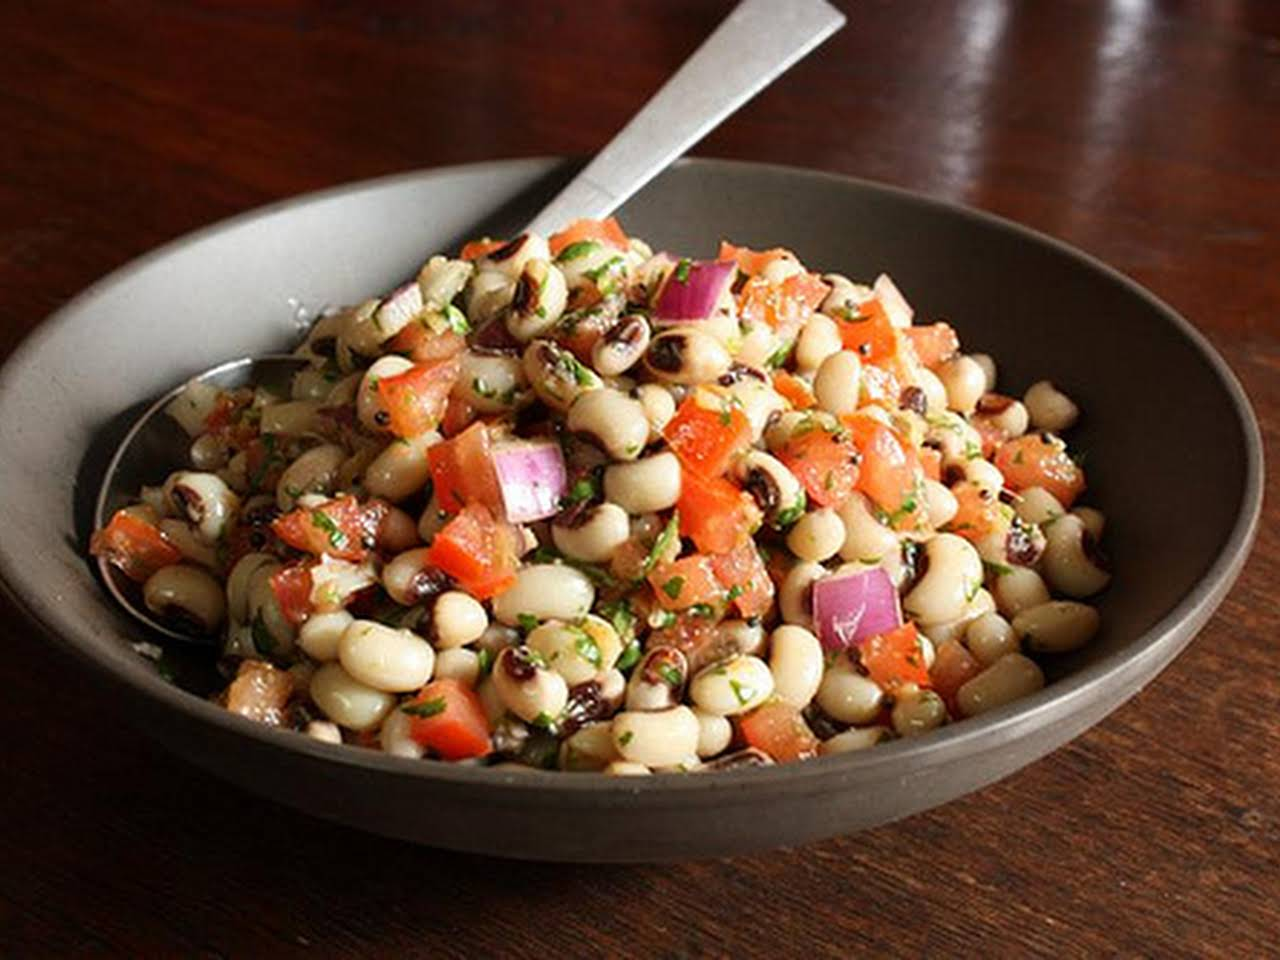 Spicy Black Eyed Peas Recipe